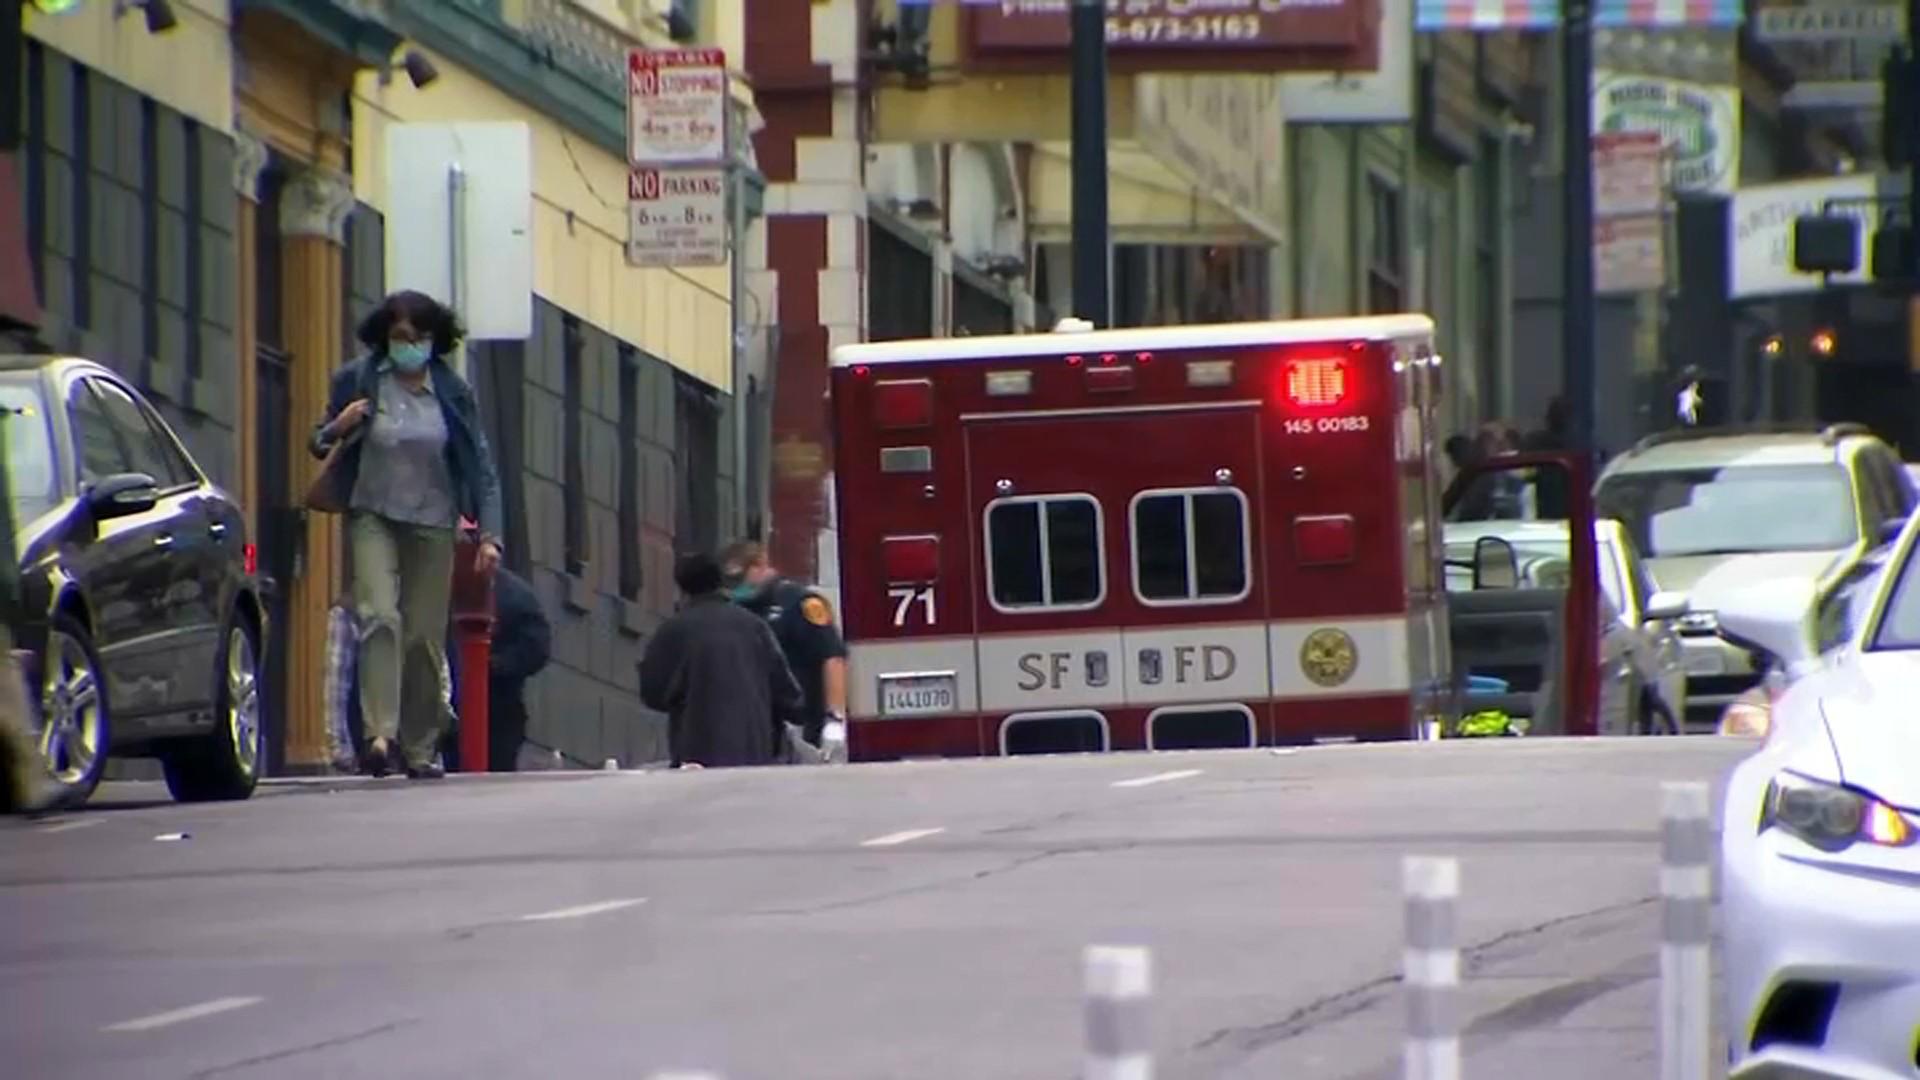 www.nbcbayarea.com: Leaders, Public Condemn Attacks on Elderly Asian Women in San Francisco